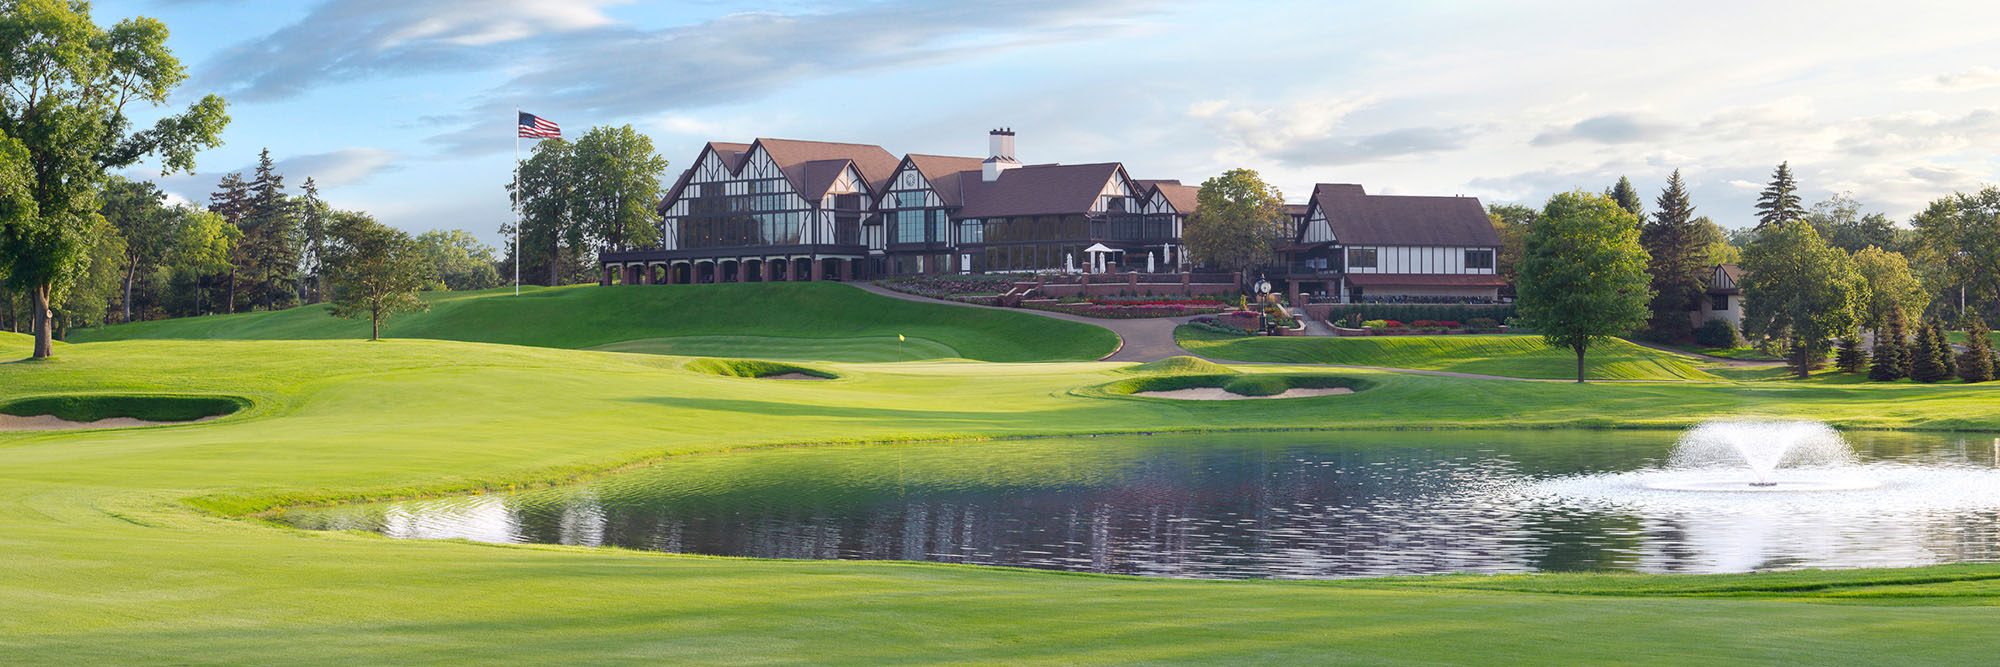 Golf Course Image - Interlachen Country Club No. 9